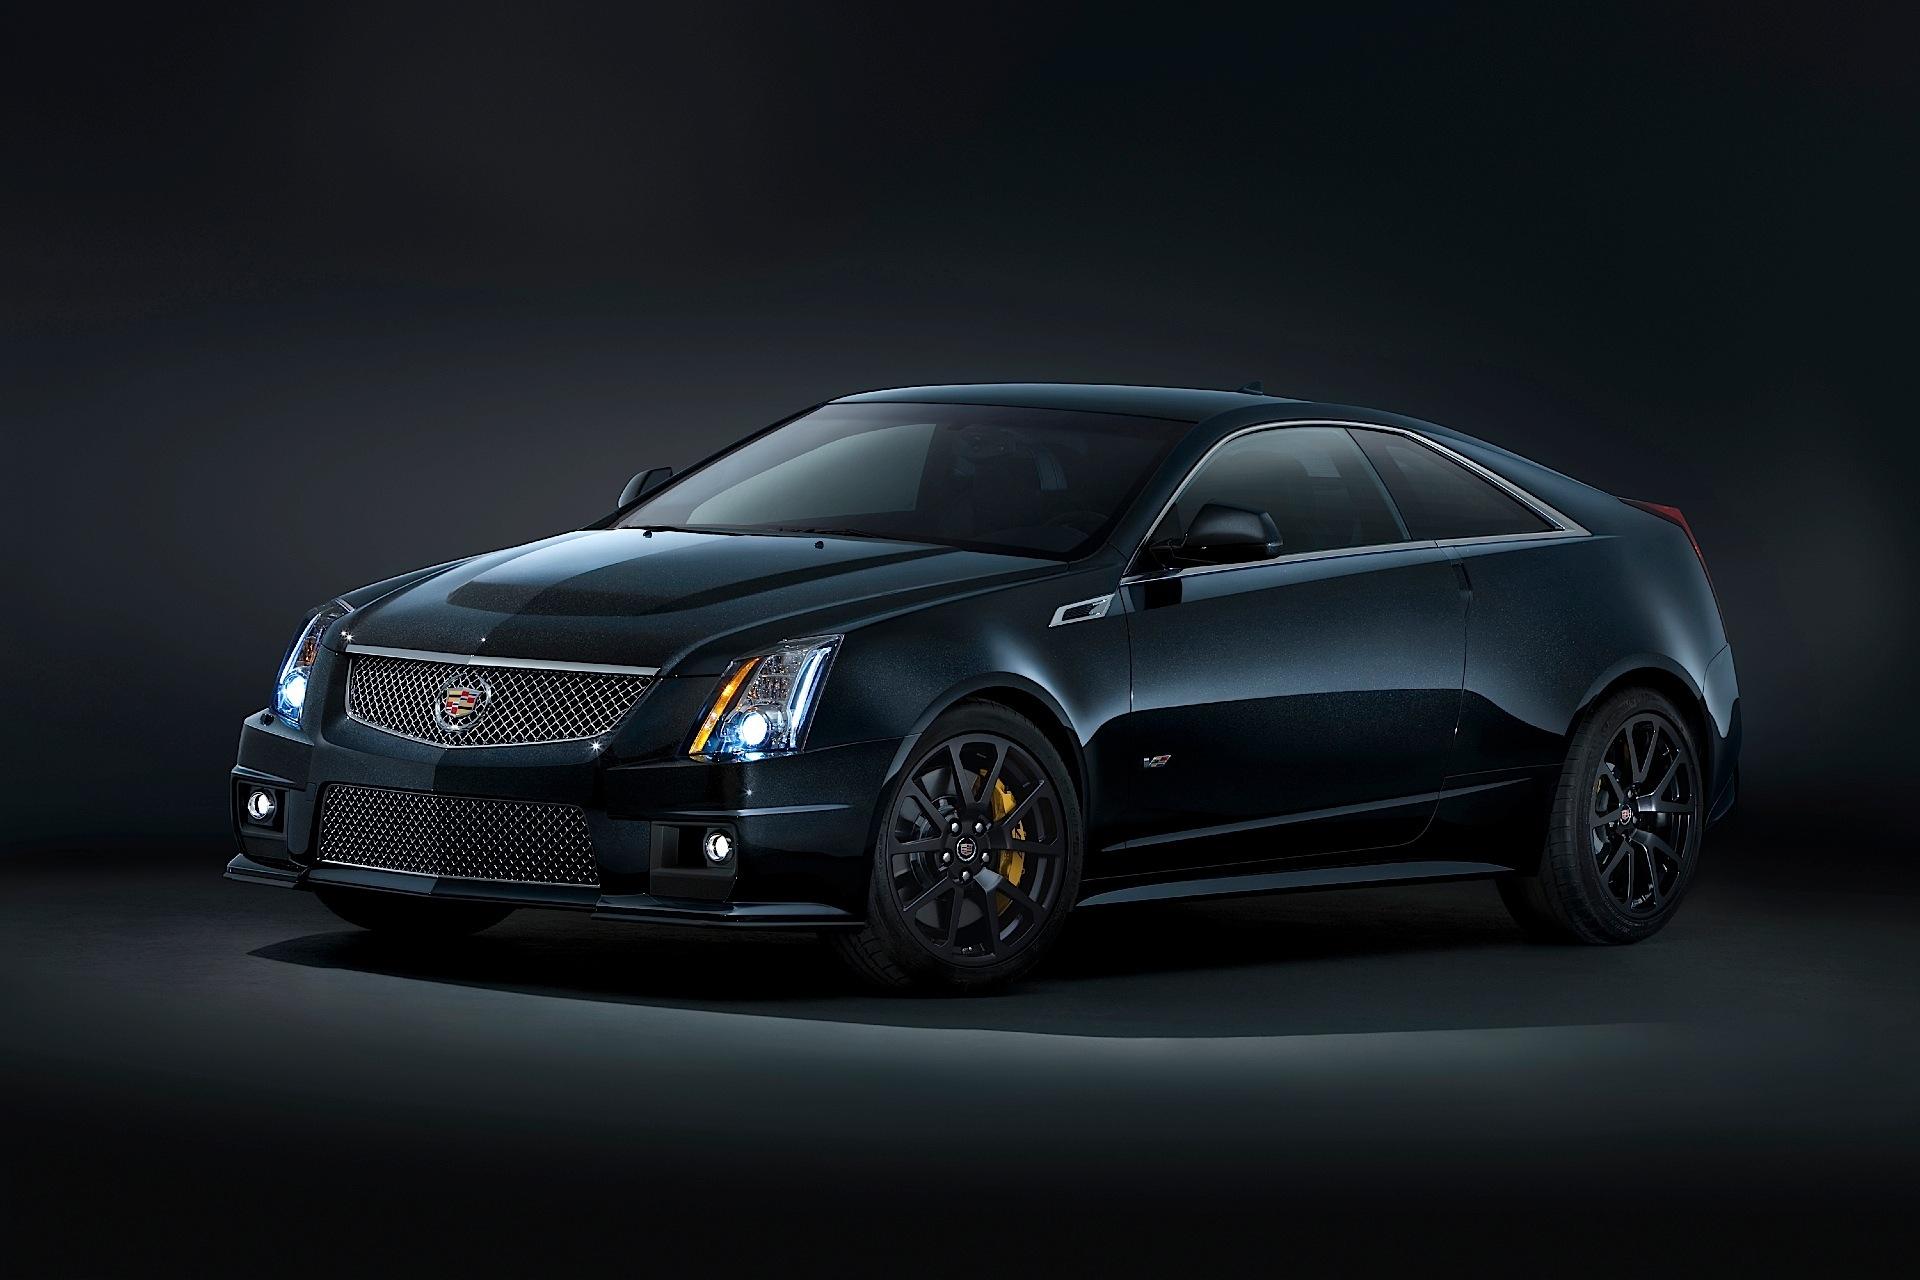 Cadillac Ctsv Coupe  2012, 2013, 2014, 2015, 2016, 2017